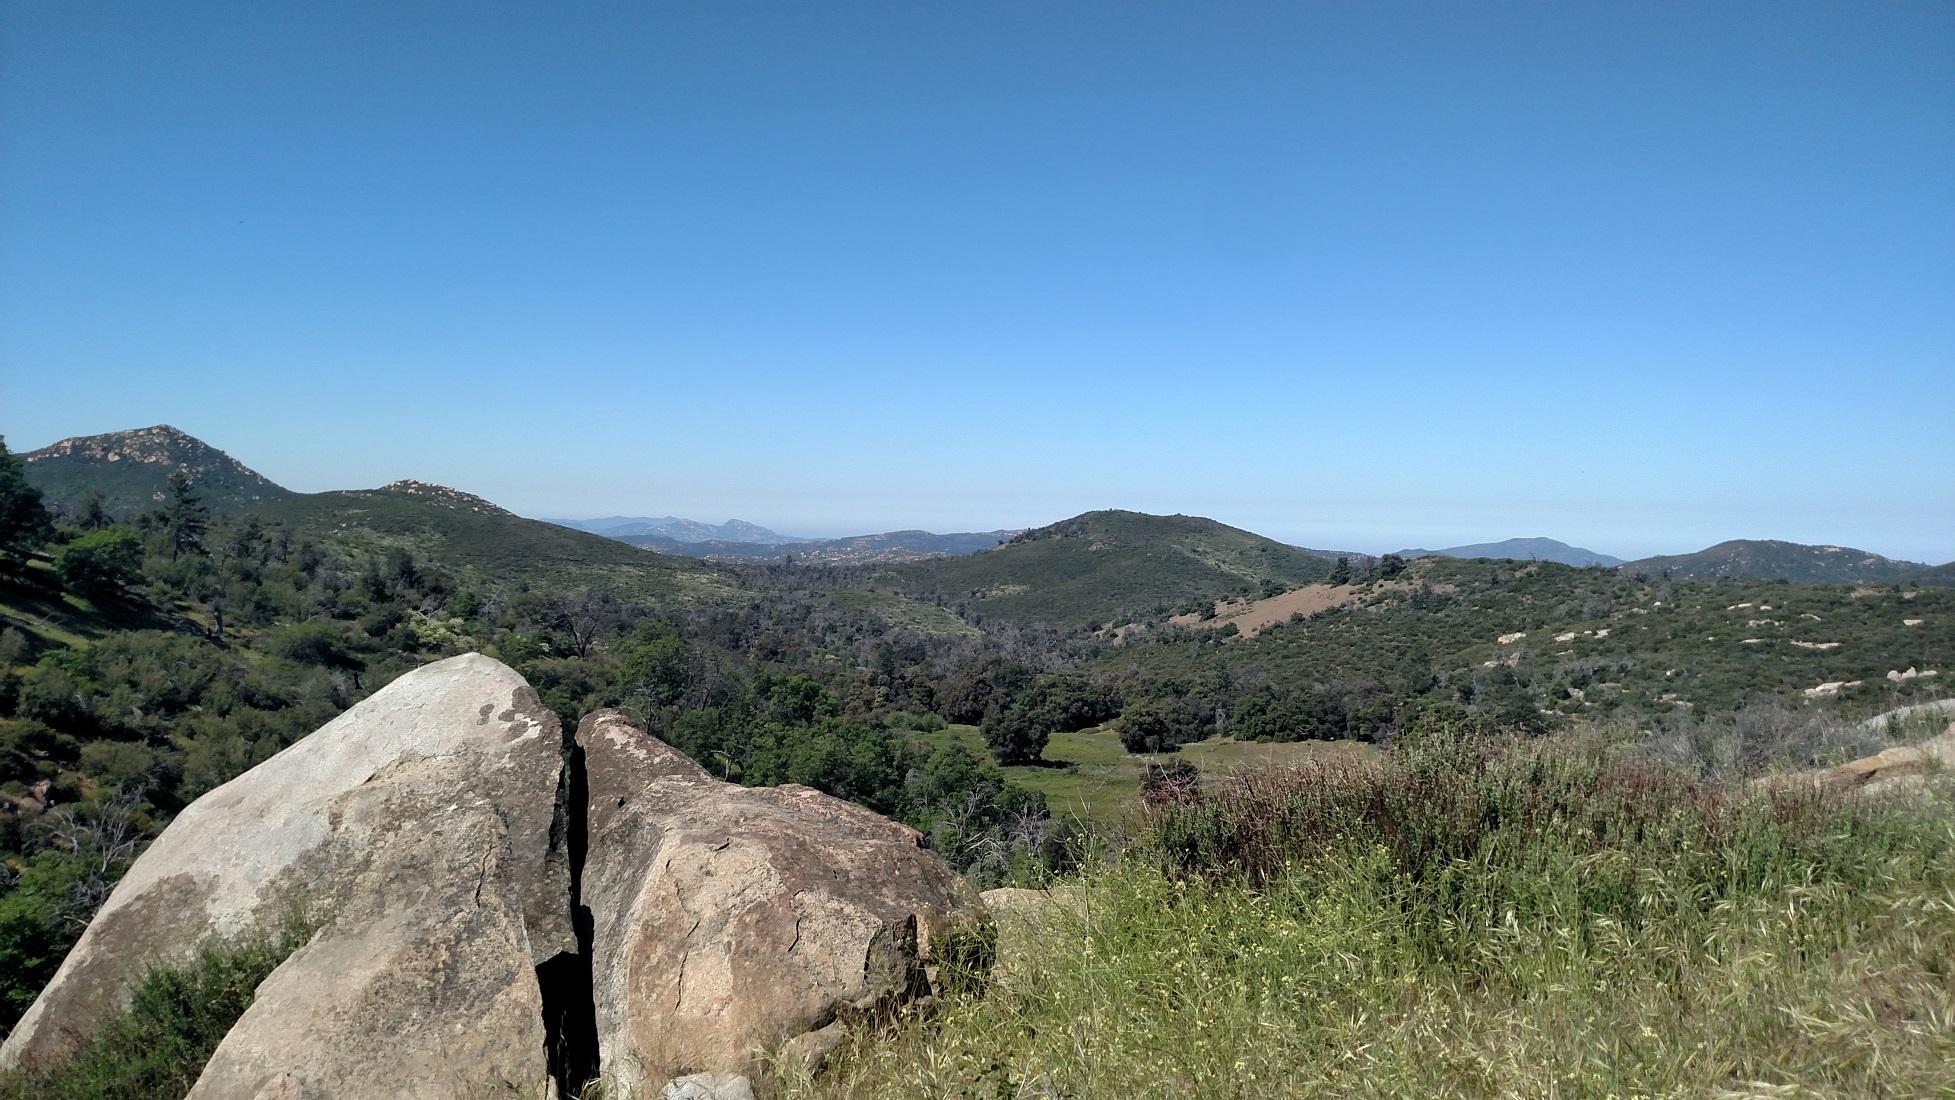 Dyar Spring Trail, Cuyamaca Rancho State Park